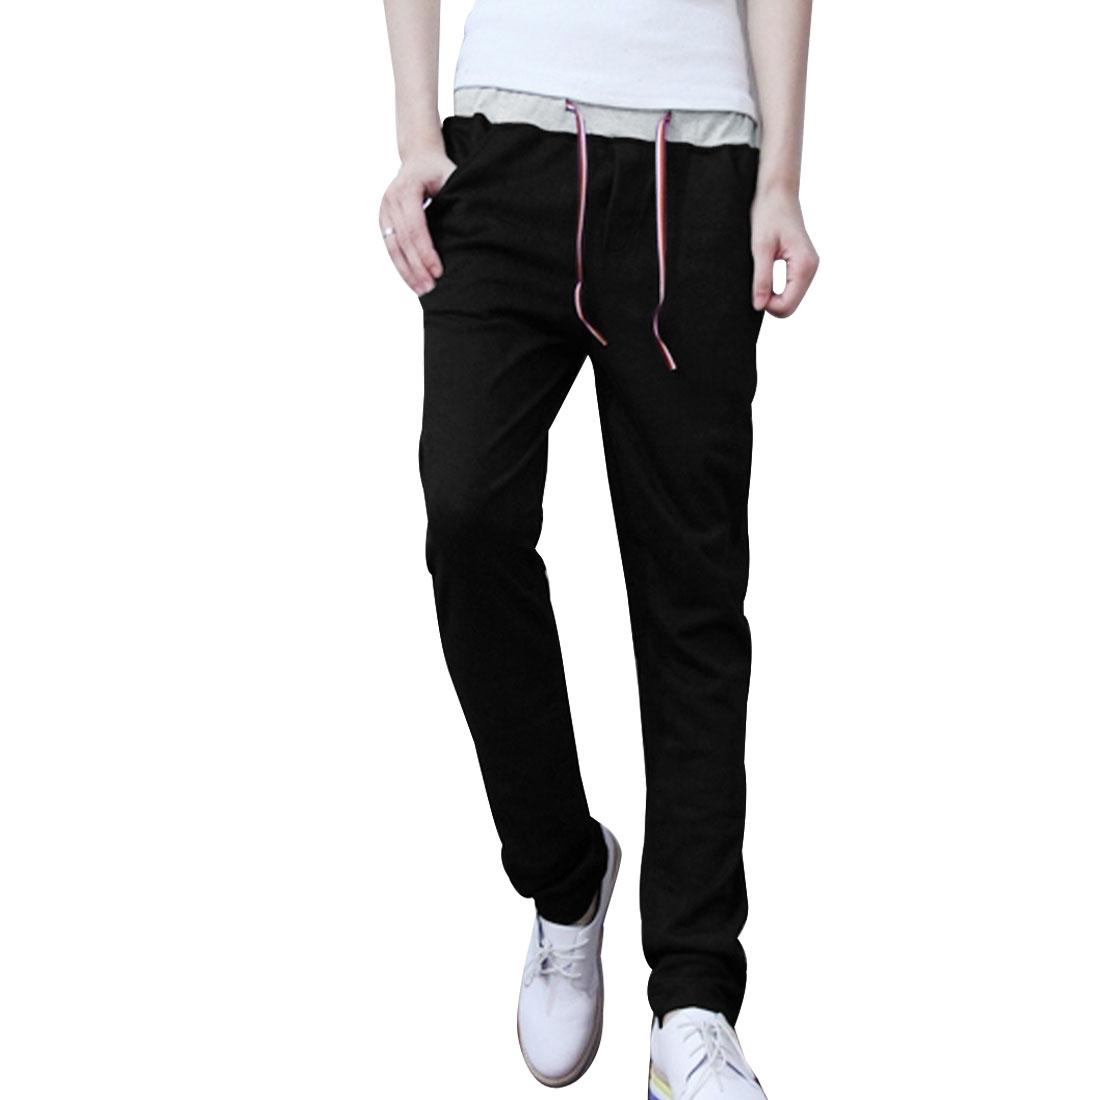 Mens Low Rise Elastic Waistband Autumn New Fashion Casual Black Pants W27